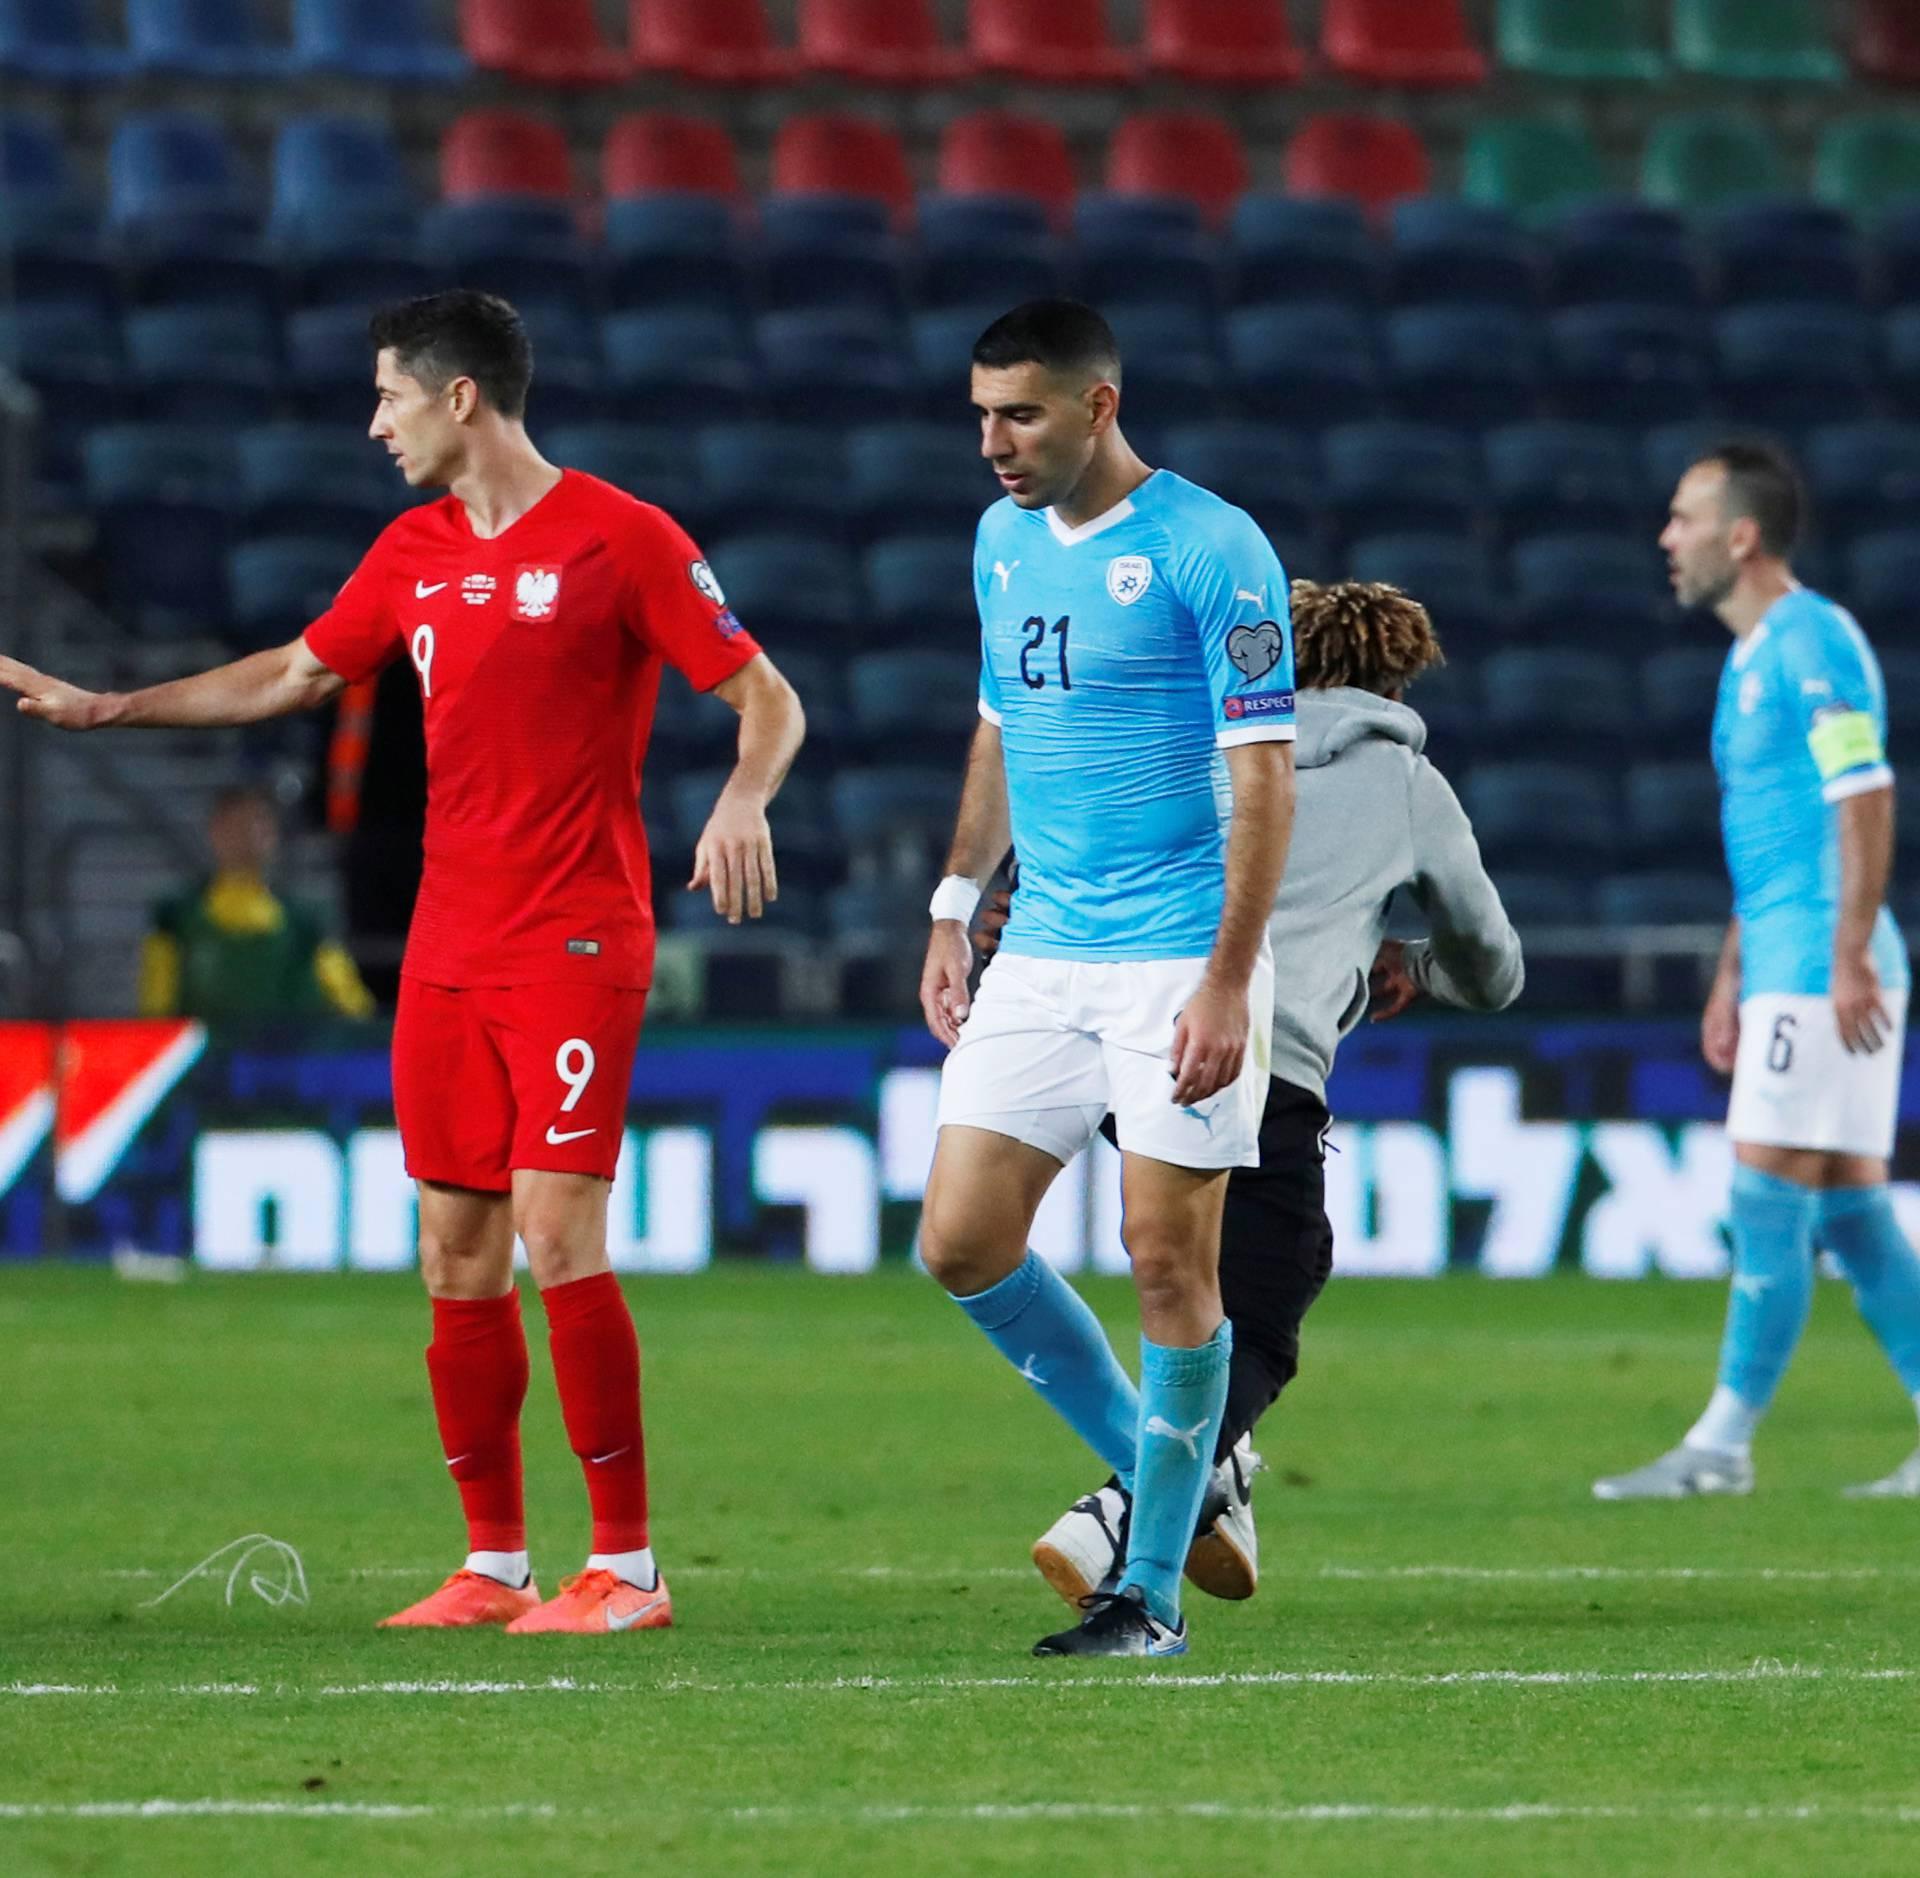 Euro 2020 Qualifier - Group G - Israel v Poland